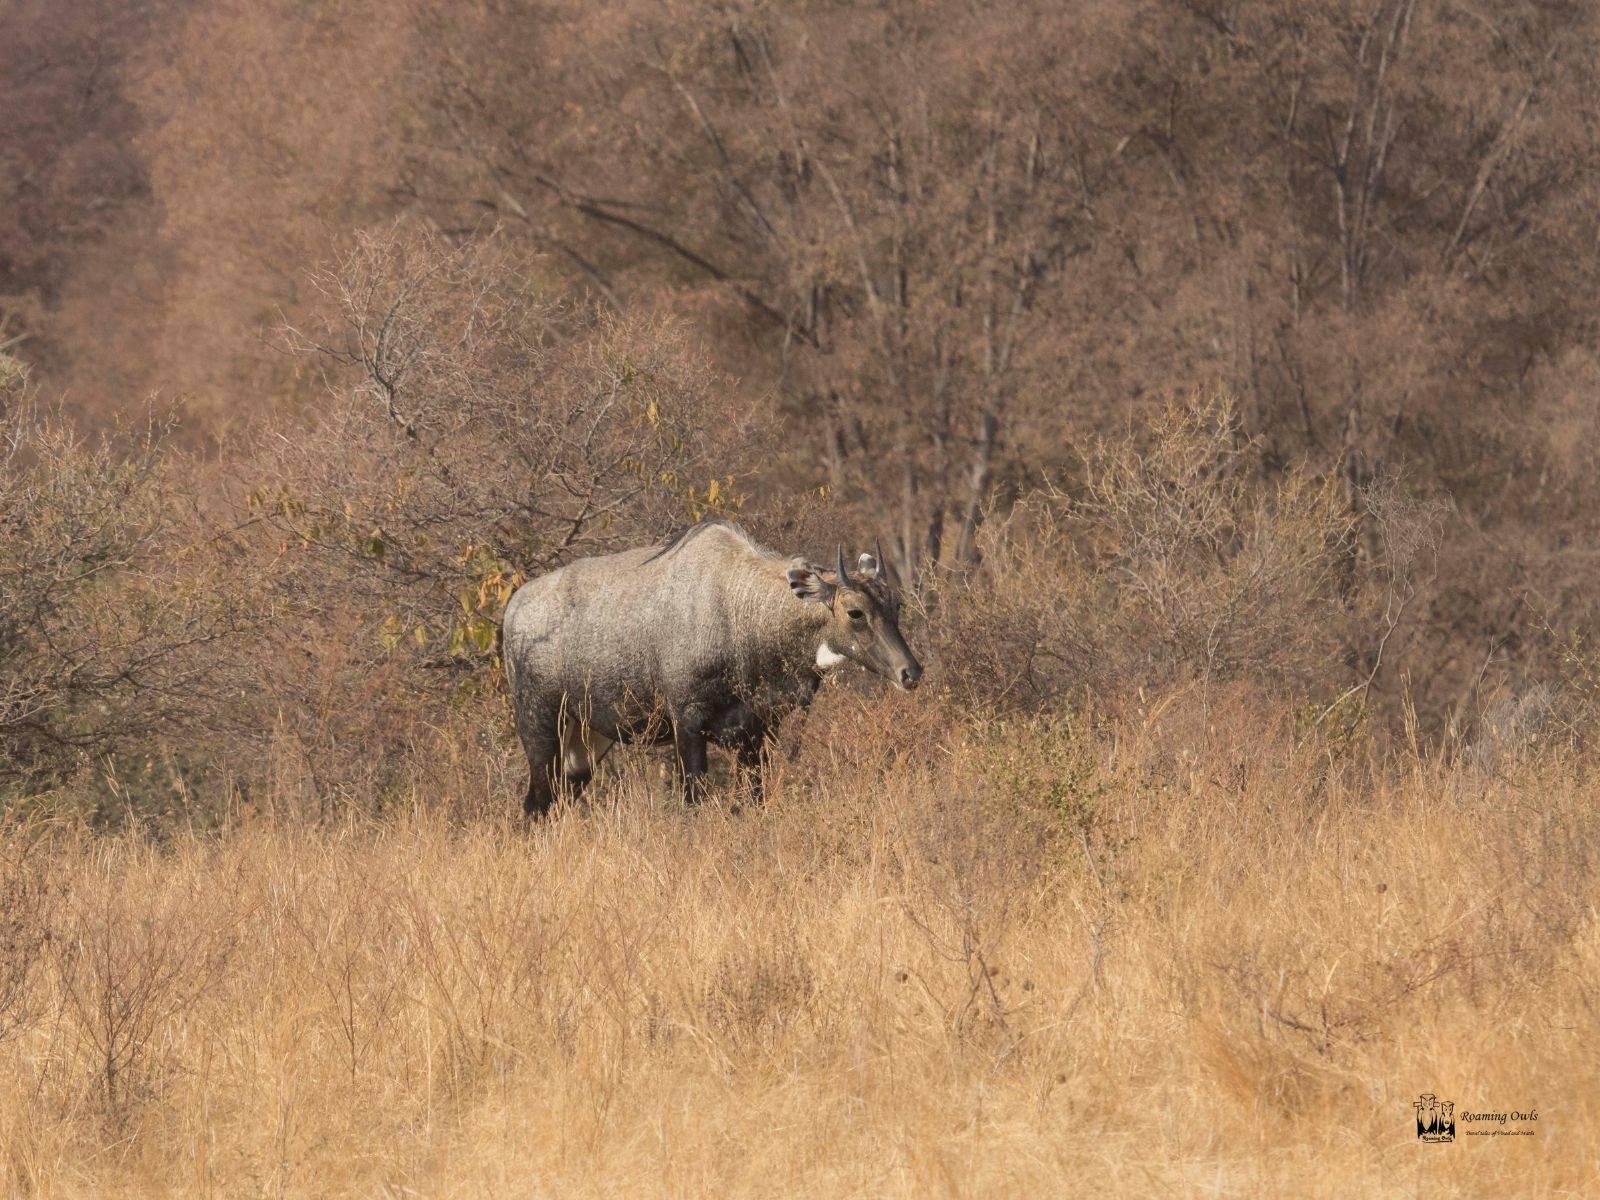 NIlgai Ranthampur,Blue Bull Ranthampur,Boselaphus tragocamelus india,Indian Mammals